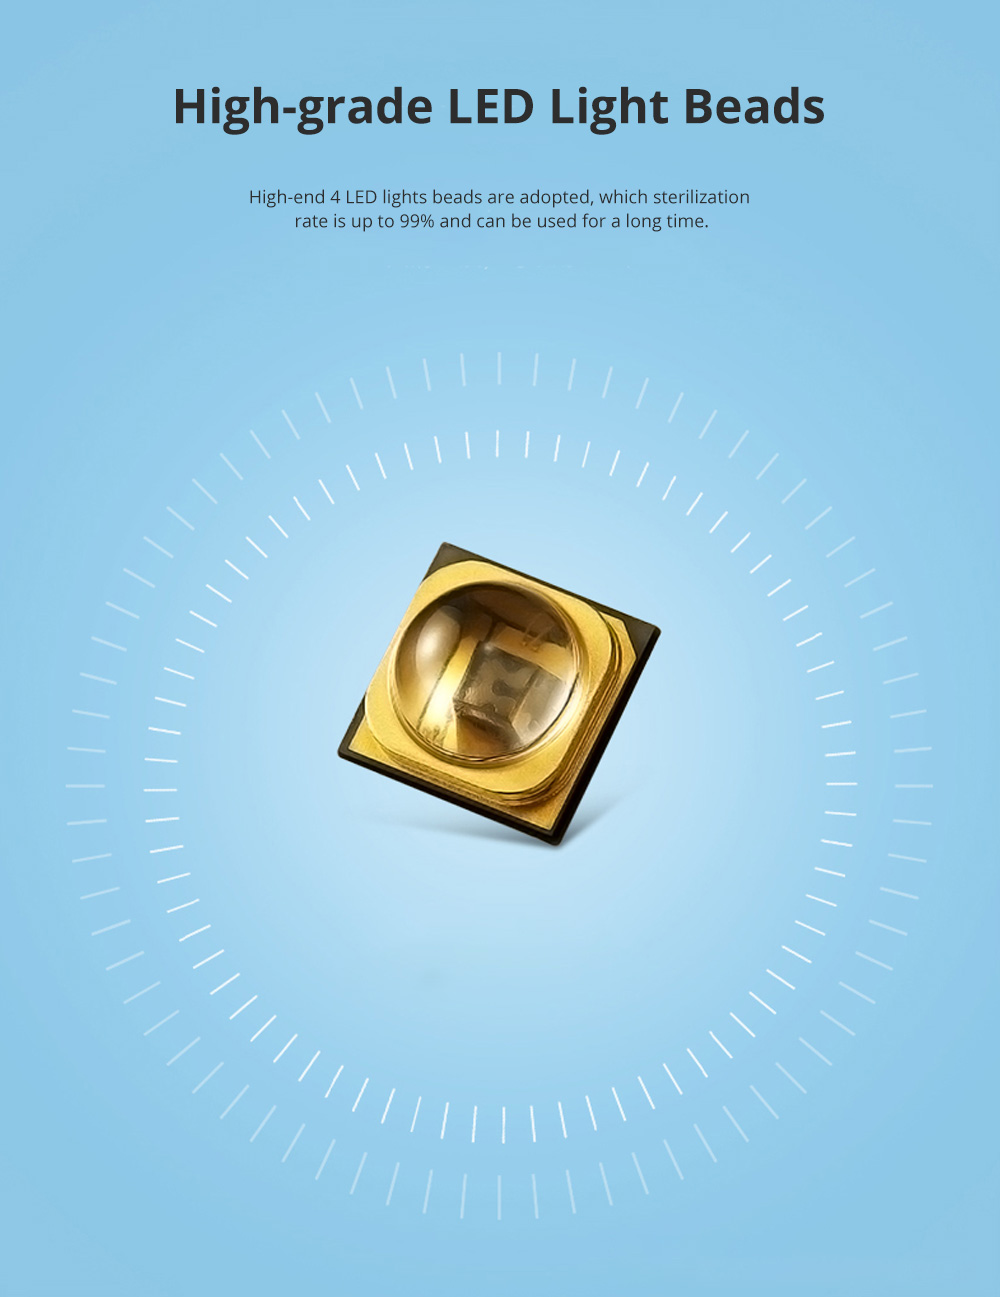 Portable Professional Quick Ultraviolet Ray Disinfectant Machine Bowls Chopsticks Phone Sterilizer 4